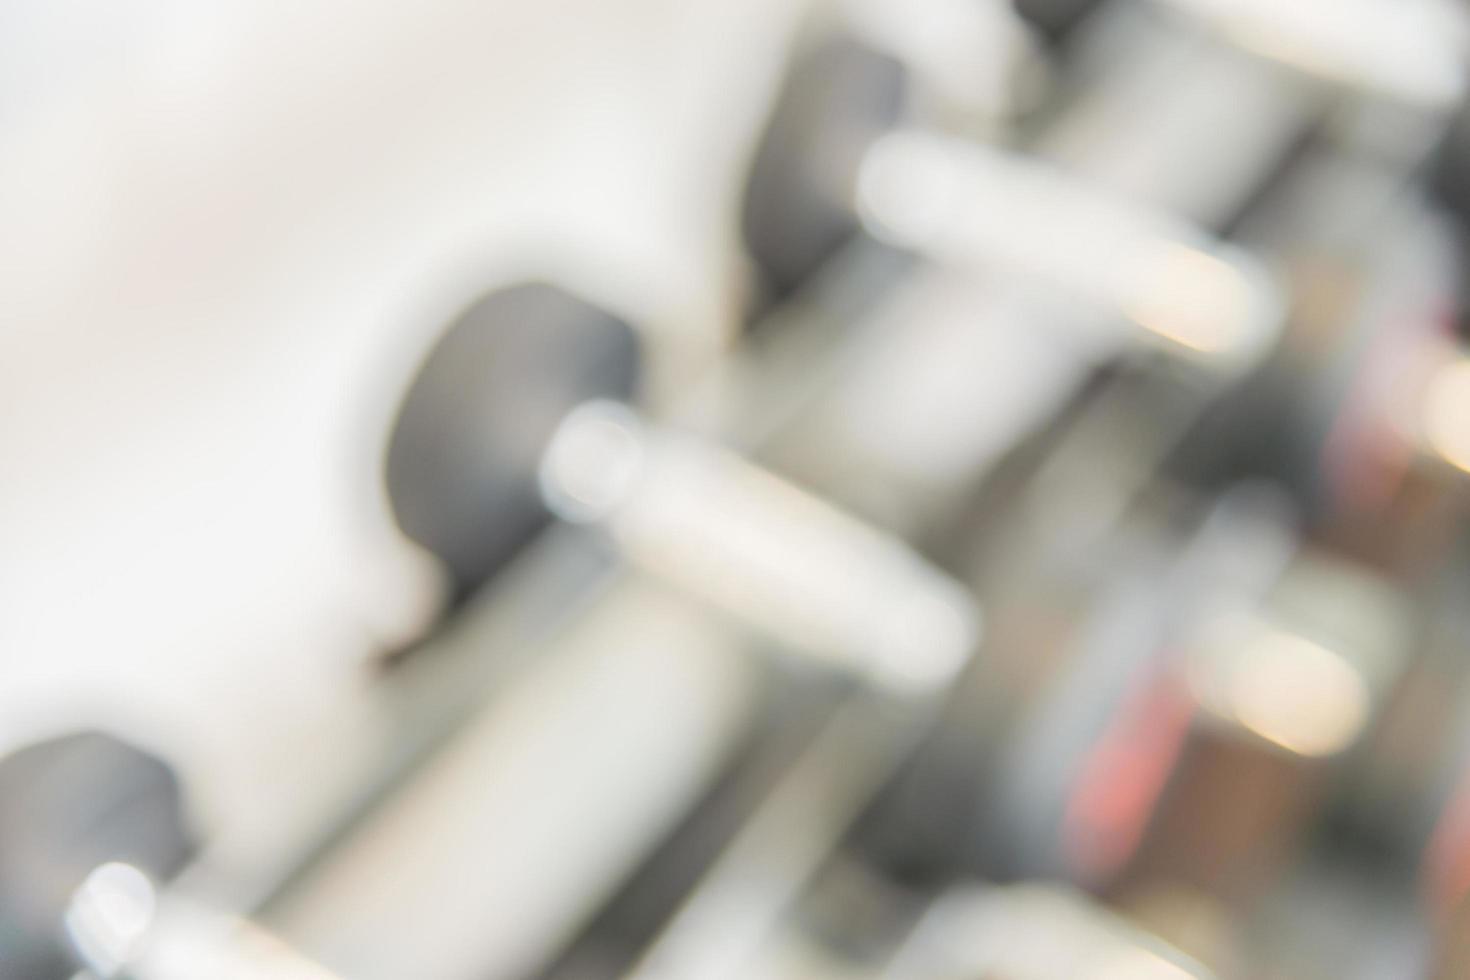 wazig halters in sportschool, achtergrond foto